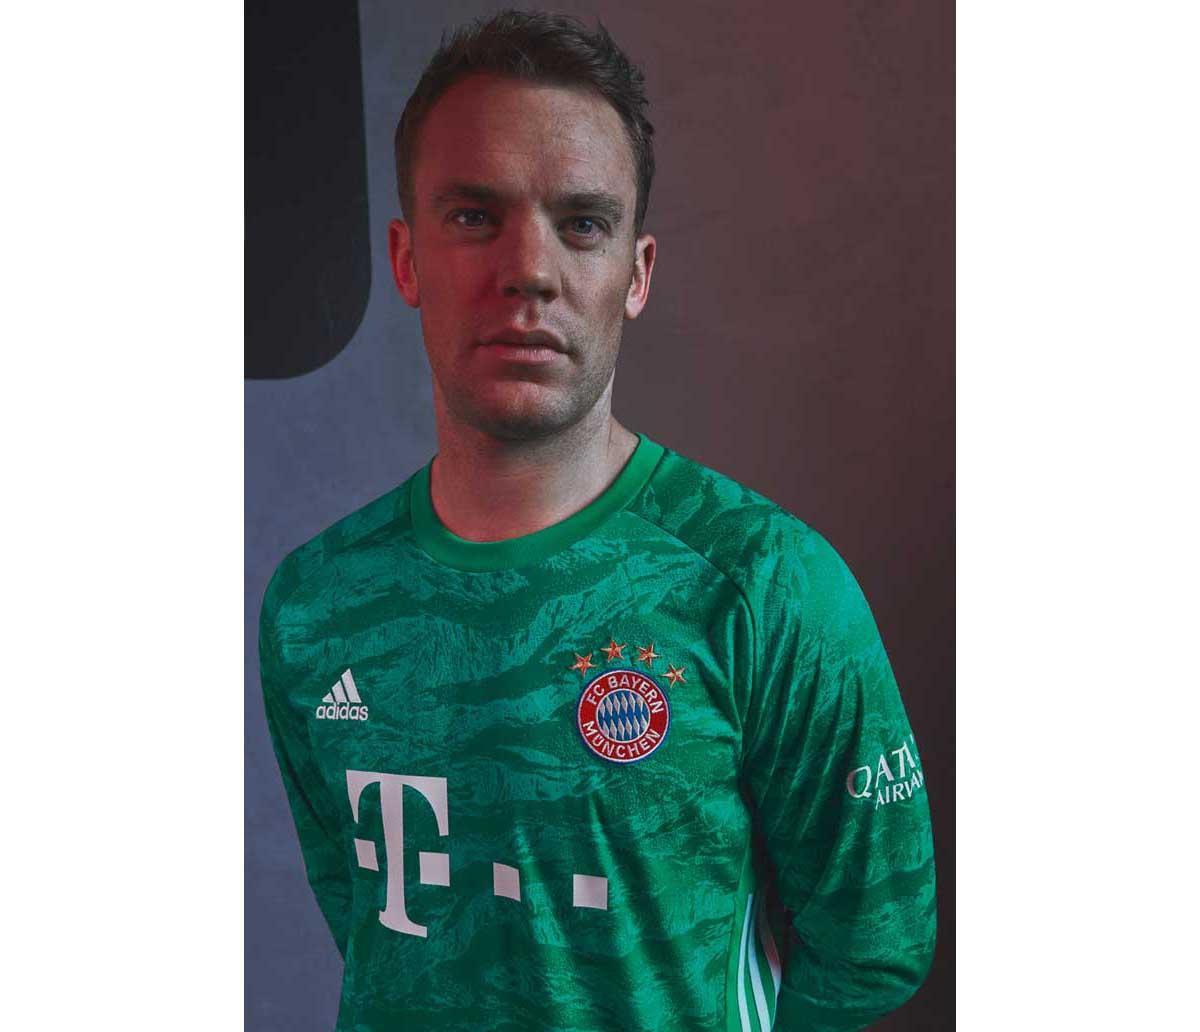 4-bayern-munich-19-20-home-shirt